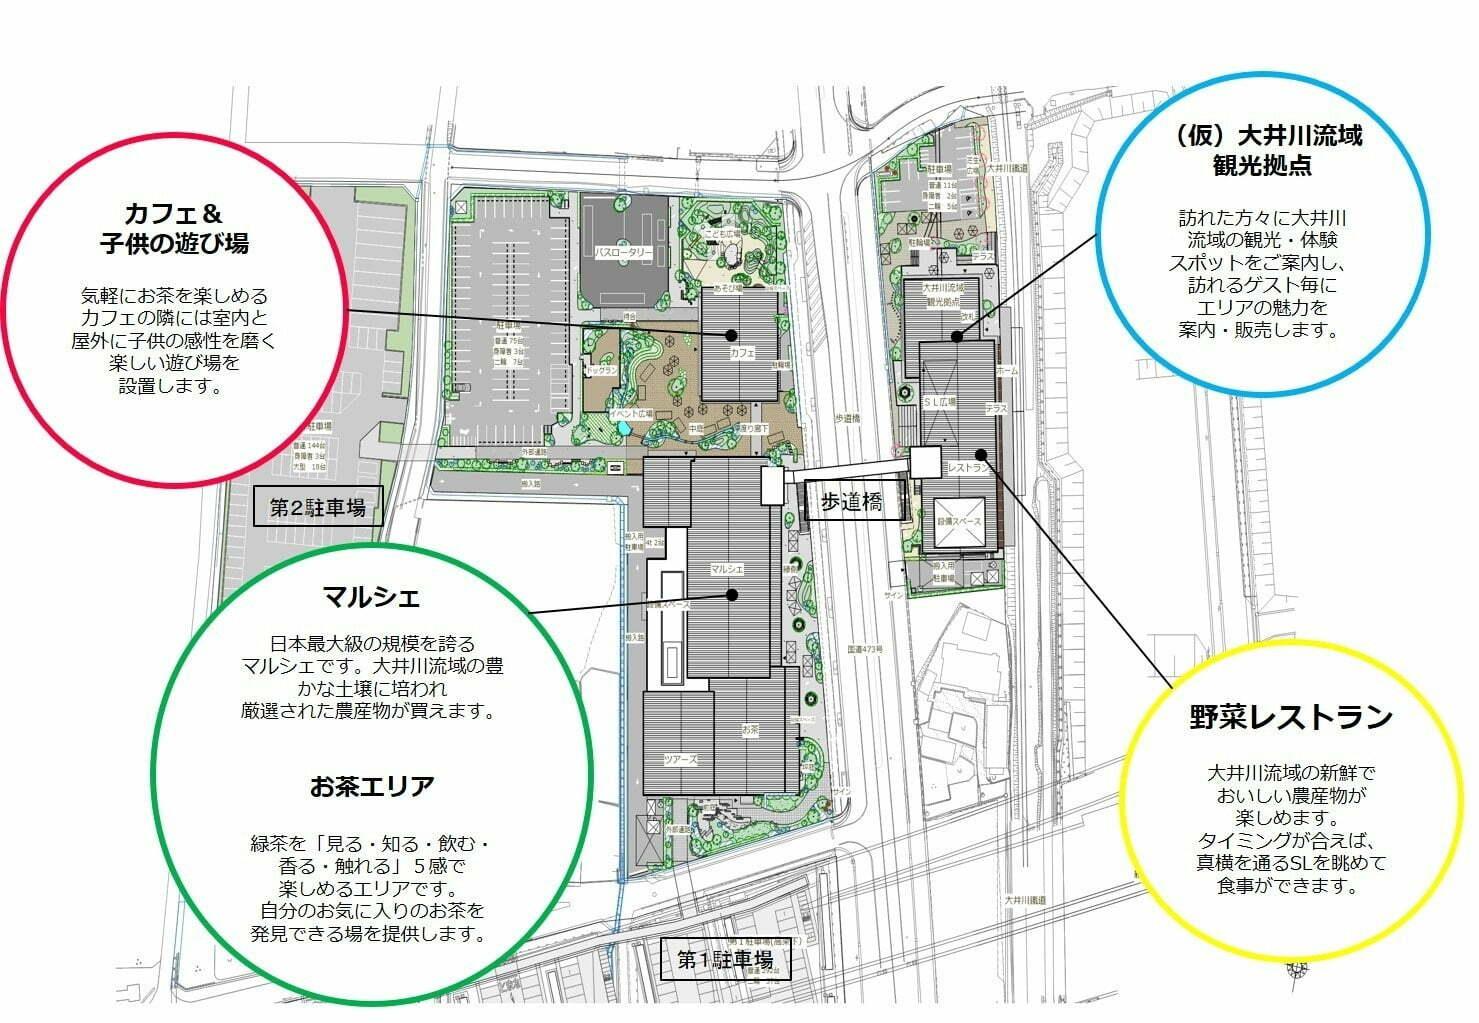 KADODE OOIGAWA 施設全体配置図